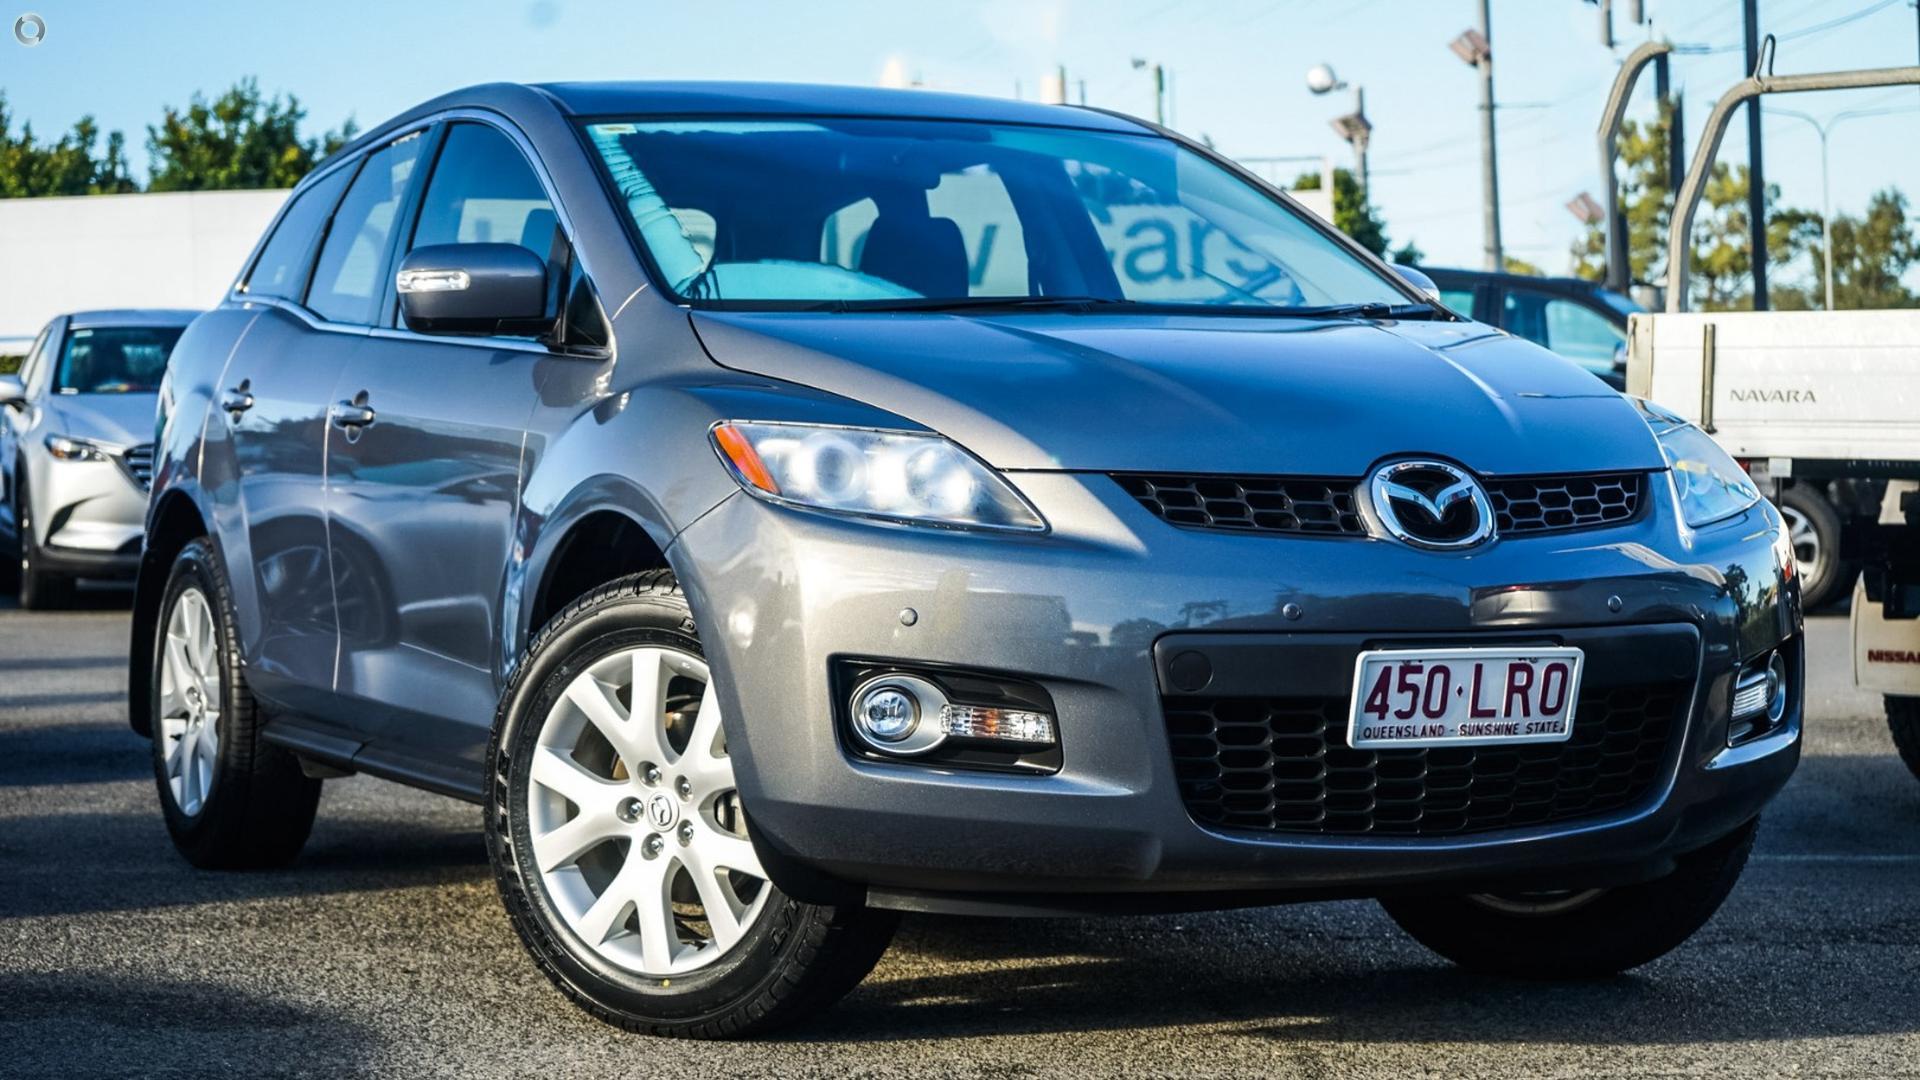 2009 Mazda Cx-7 Classic Sports